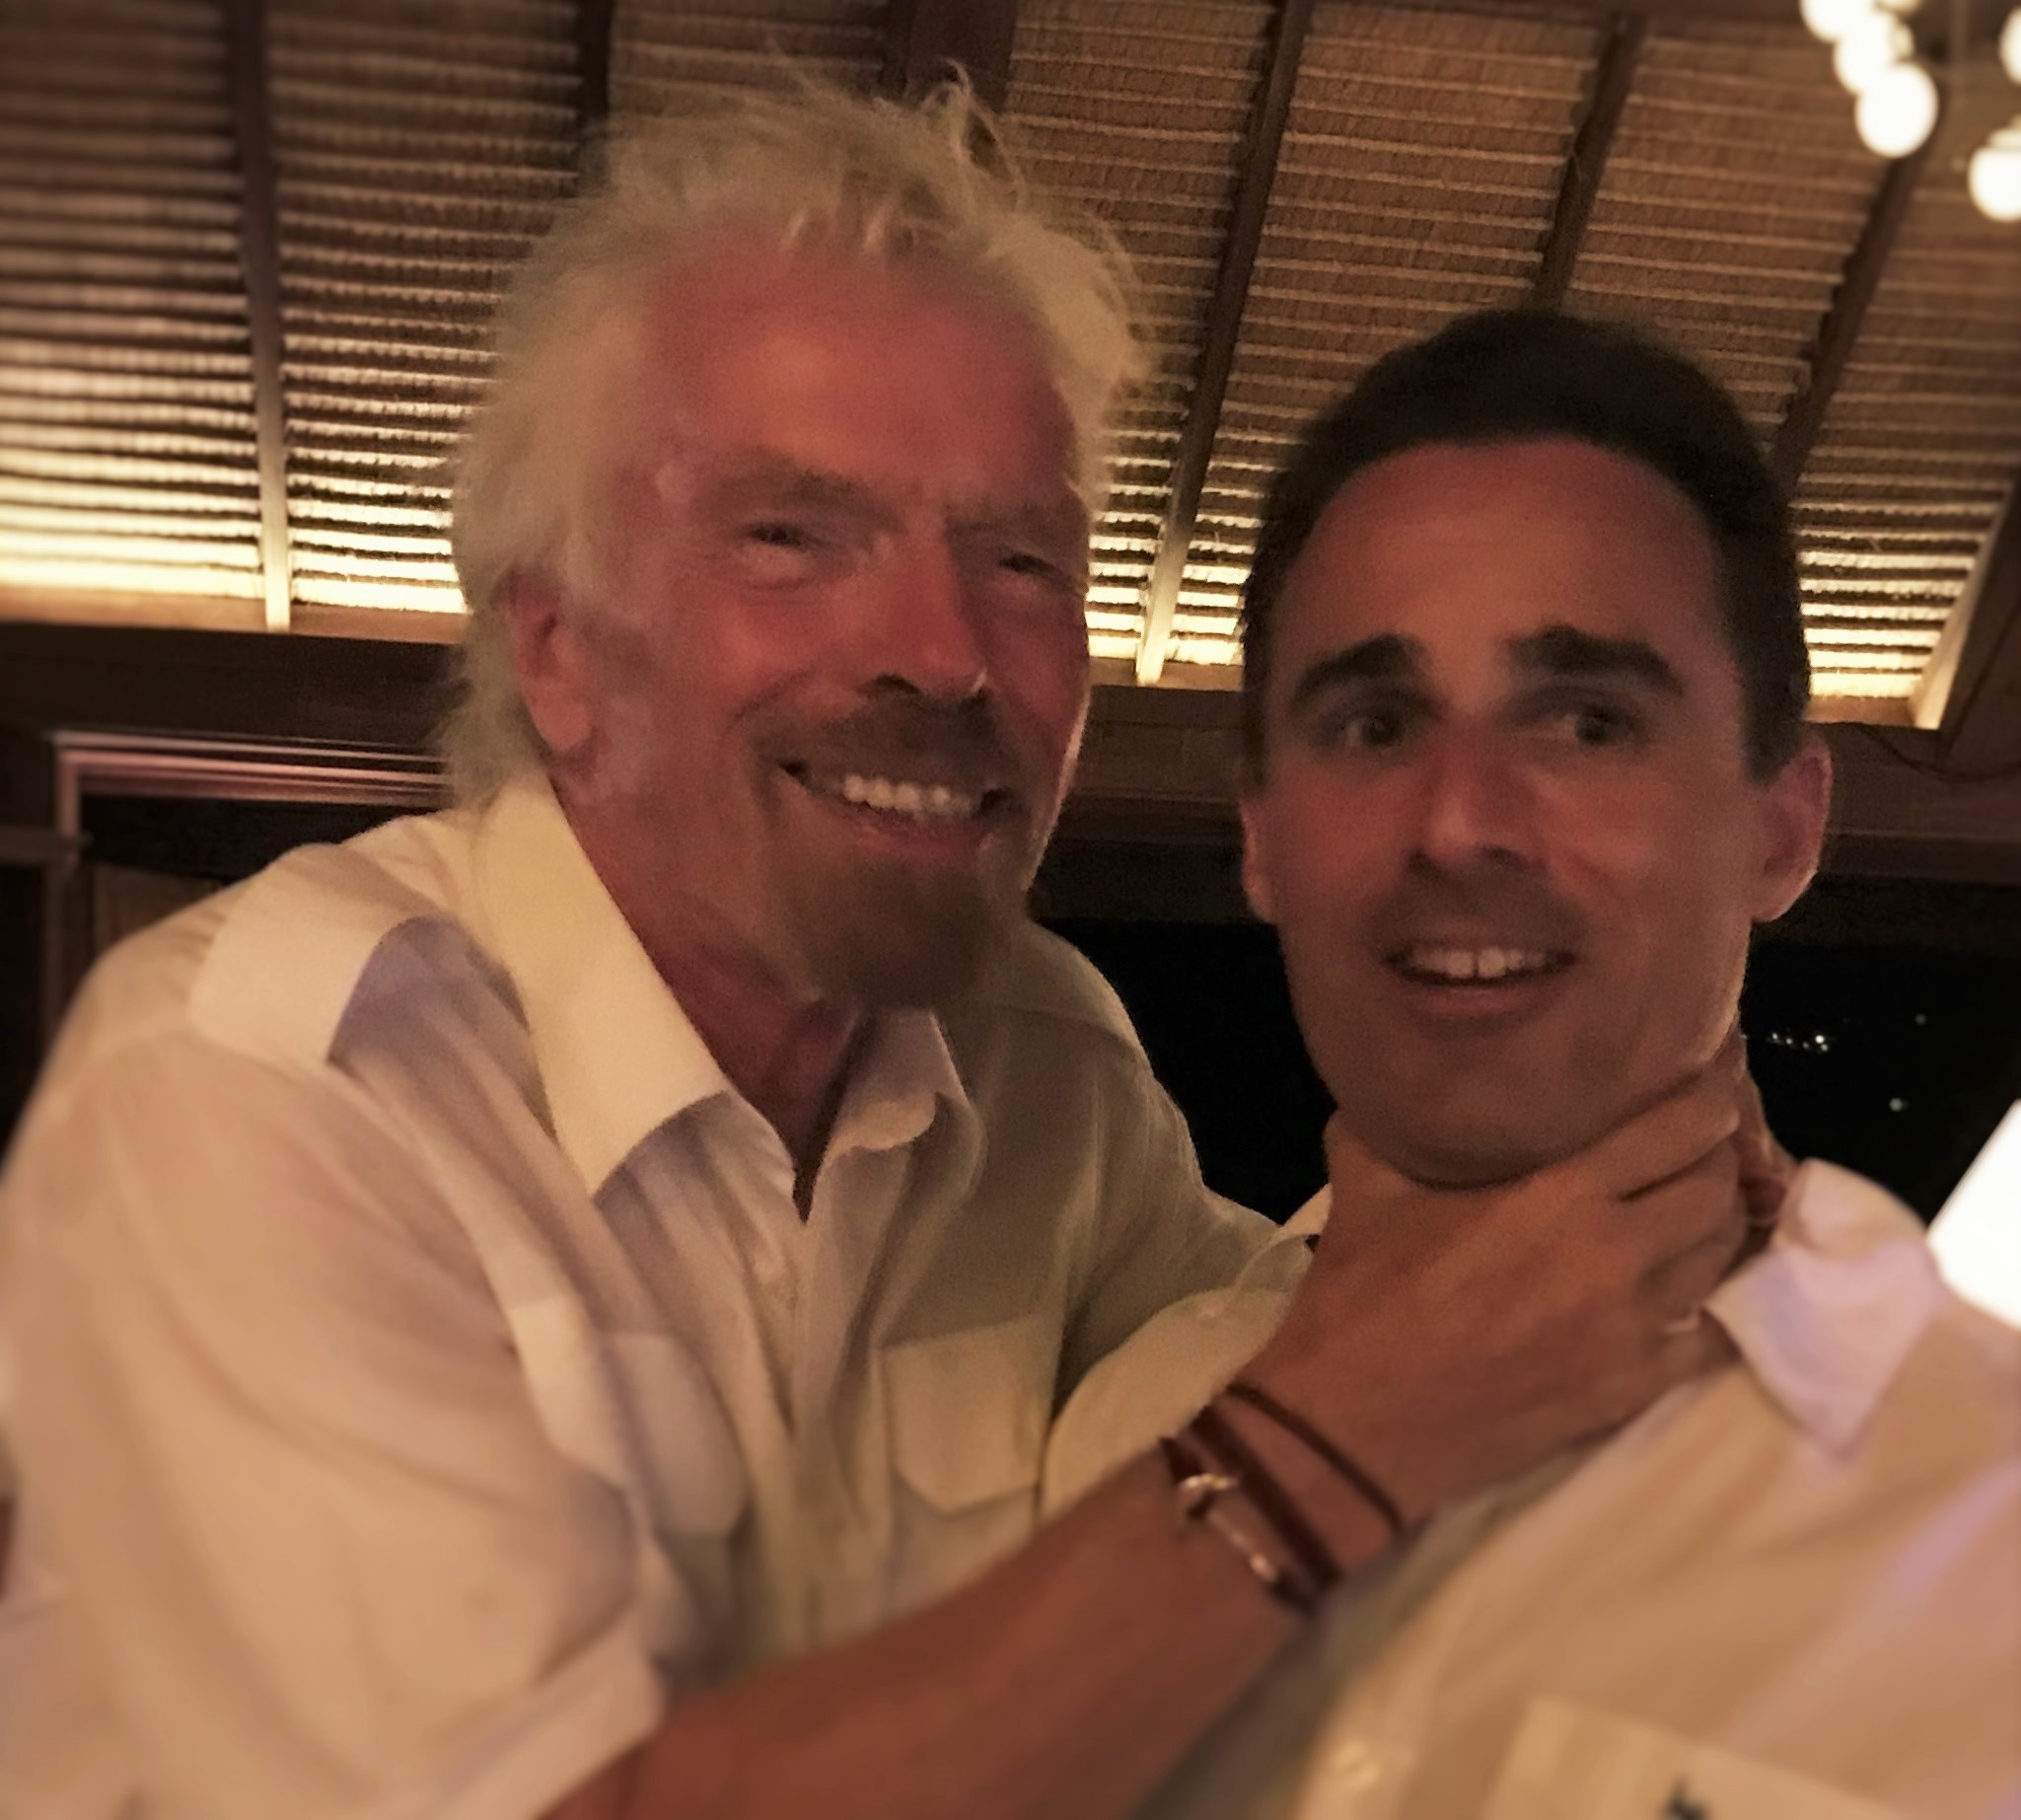 Richard Branson chokes Frequent Miler